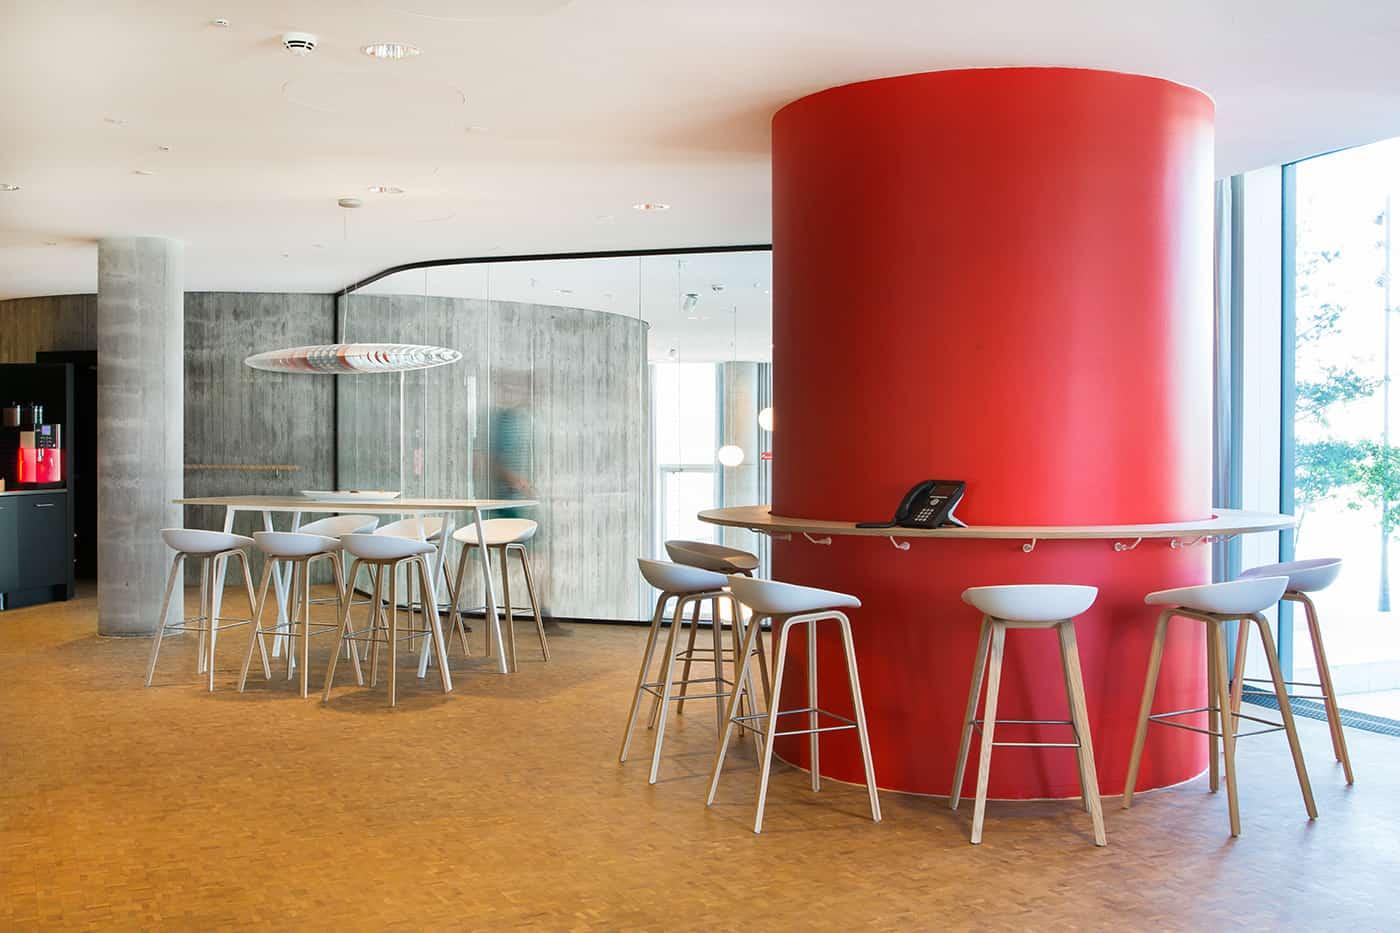 RITAarch, Exerp, indretning, København, Kontorindretning, detalje, specialinventar, specialdesign, dropin